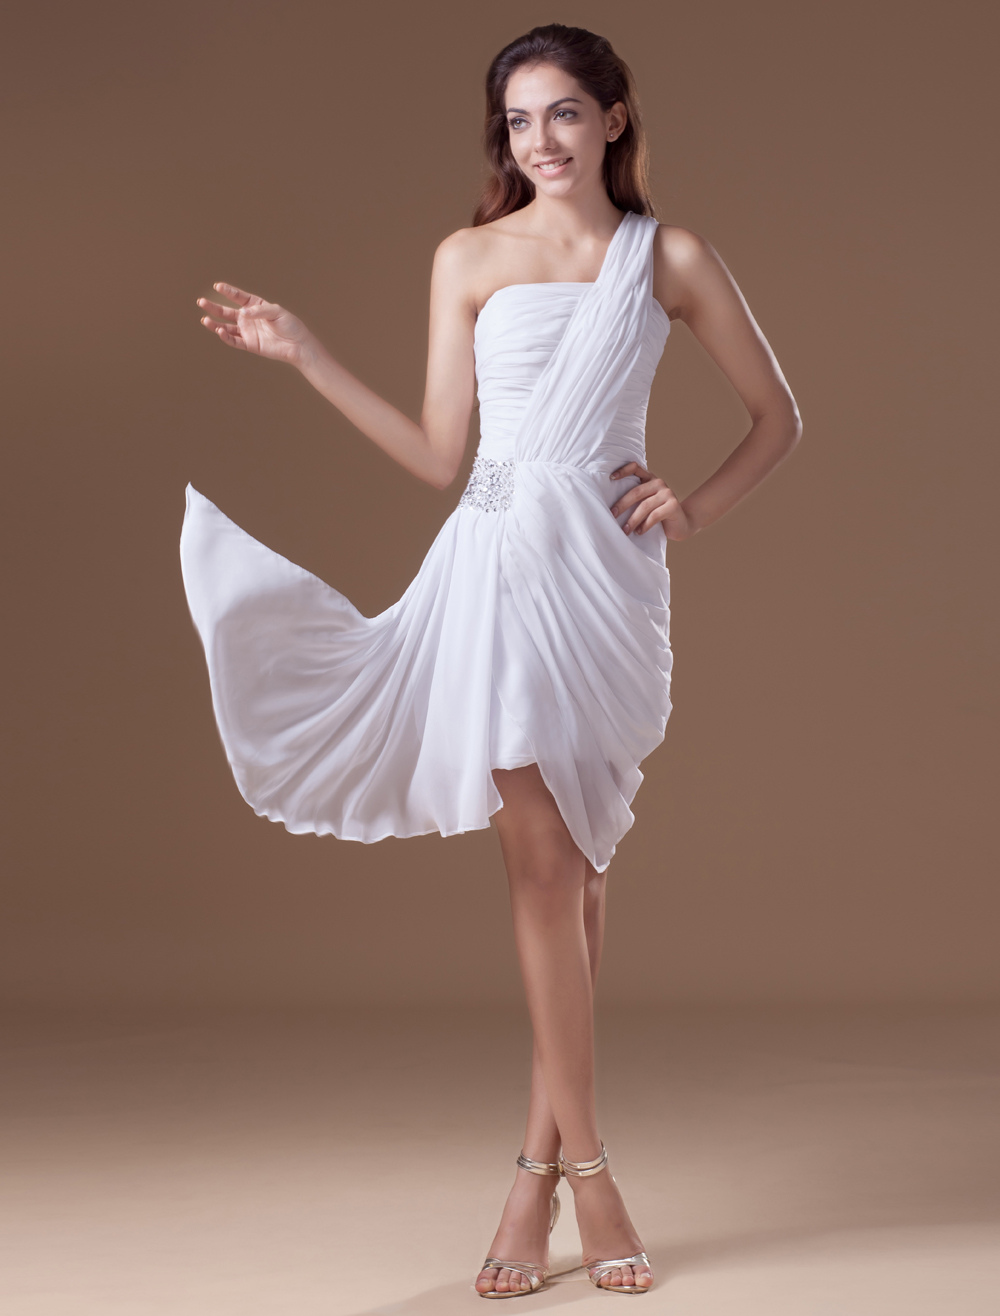 White Sheath Sequin One-Shoulder Chiffon Cocktail Dress (Wedding Cheap Party Dress) photo